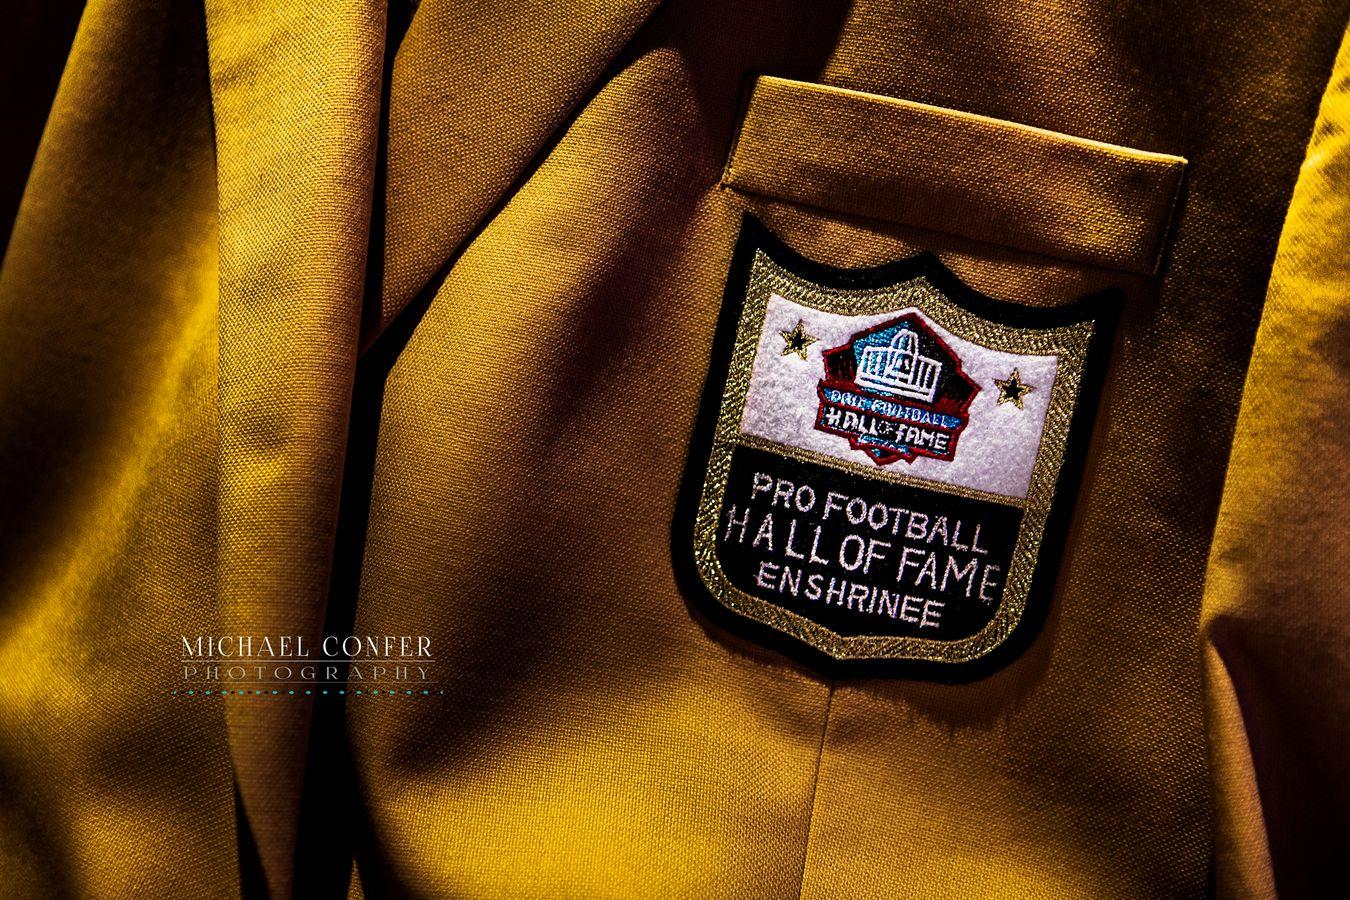 mconfer NFL Pro Football Hall of Fame Enshrinee.jpg